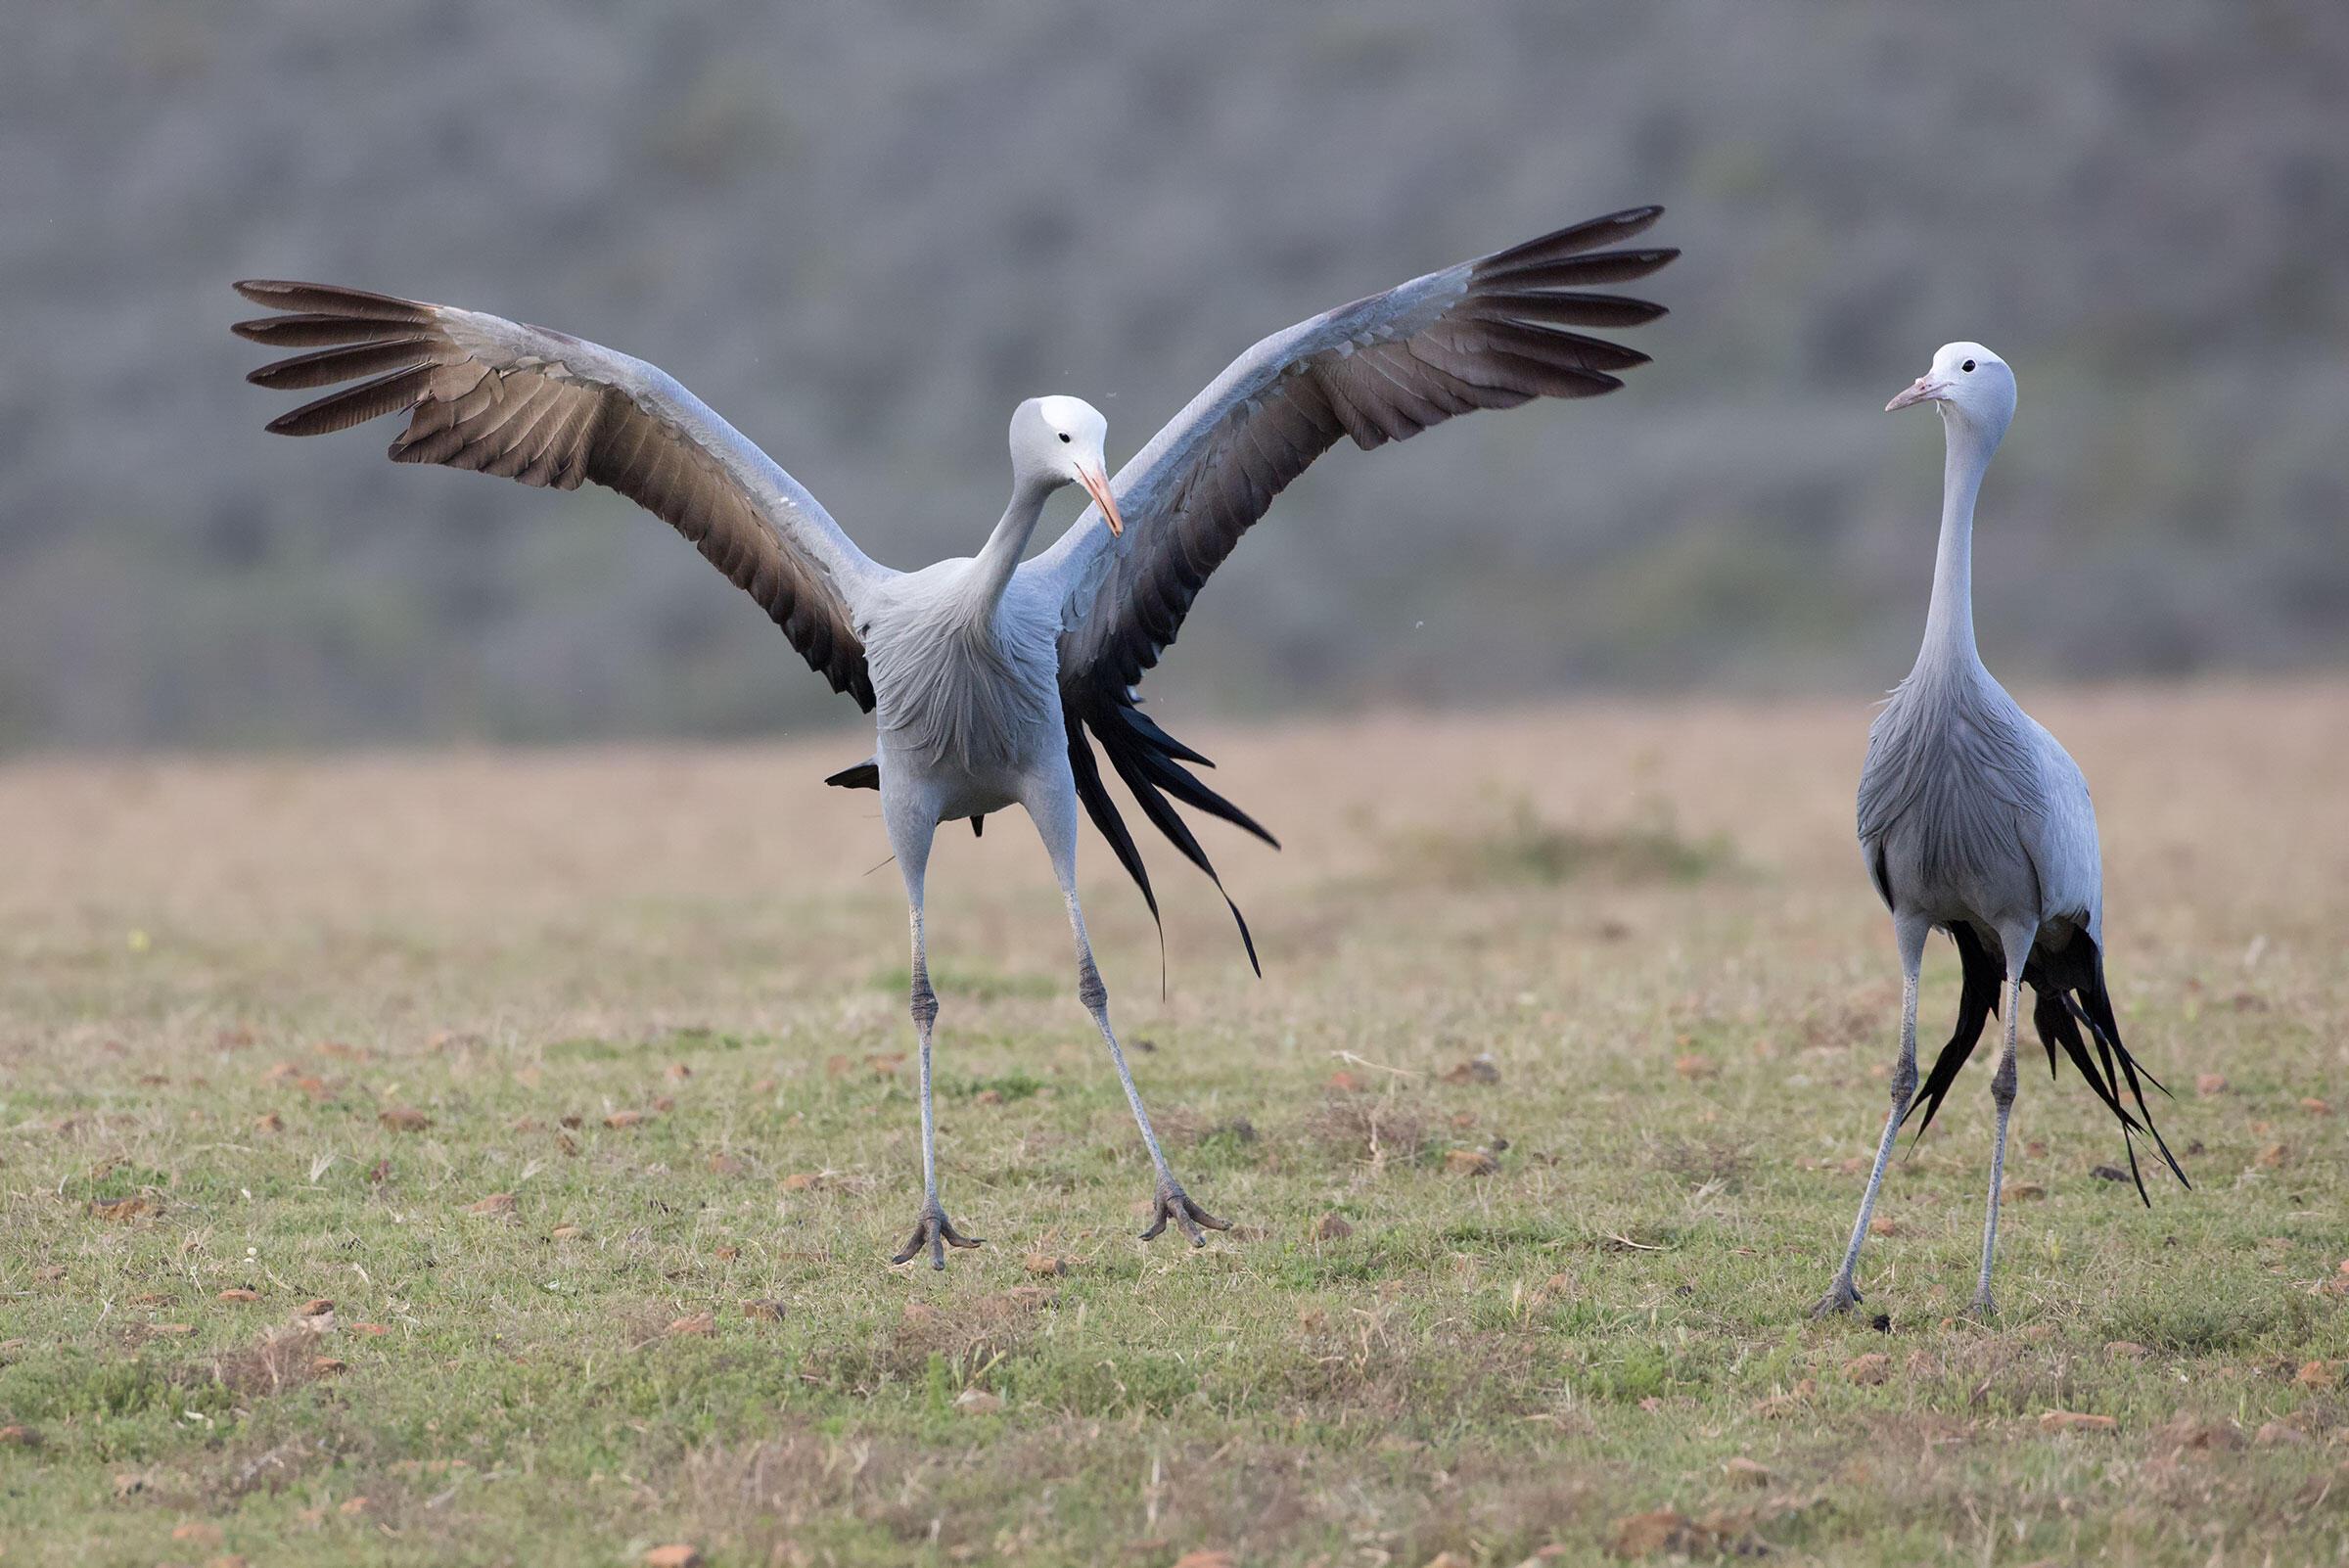 Blue Cranes. Nate Chappell/Audubon Photography Awards